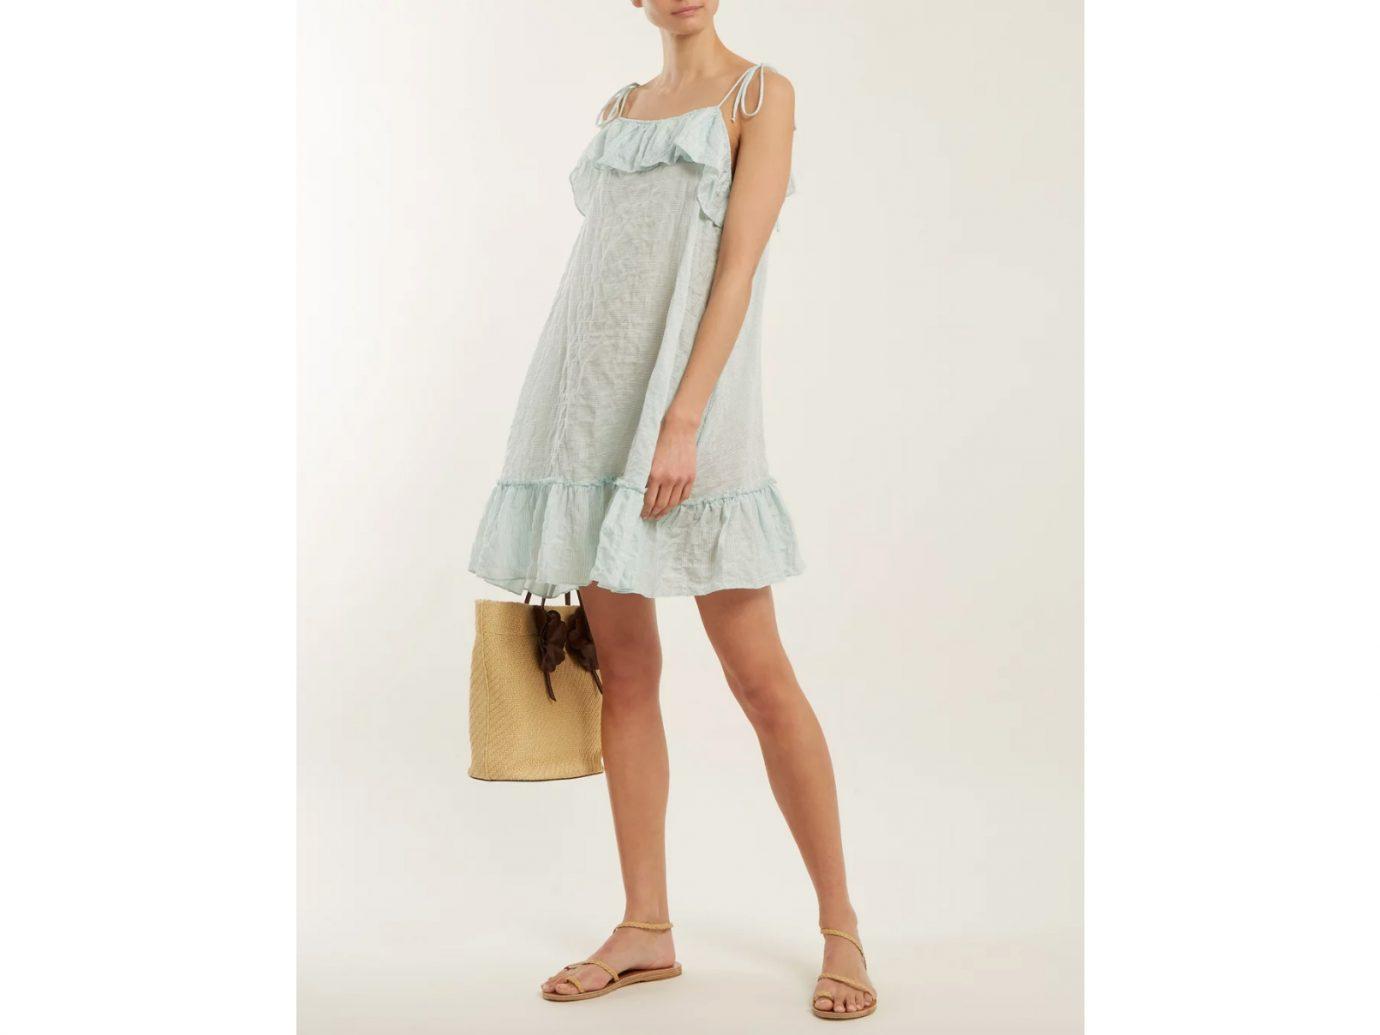 Cute Beach Cover-Ups Loup Charmant Porto Striped Cotton Dress